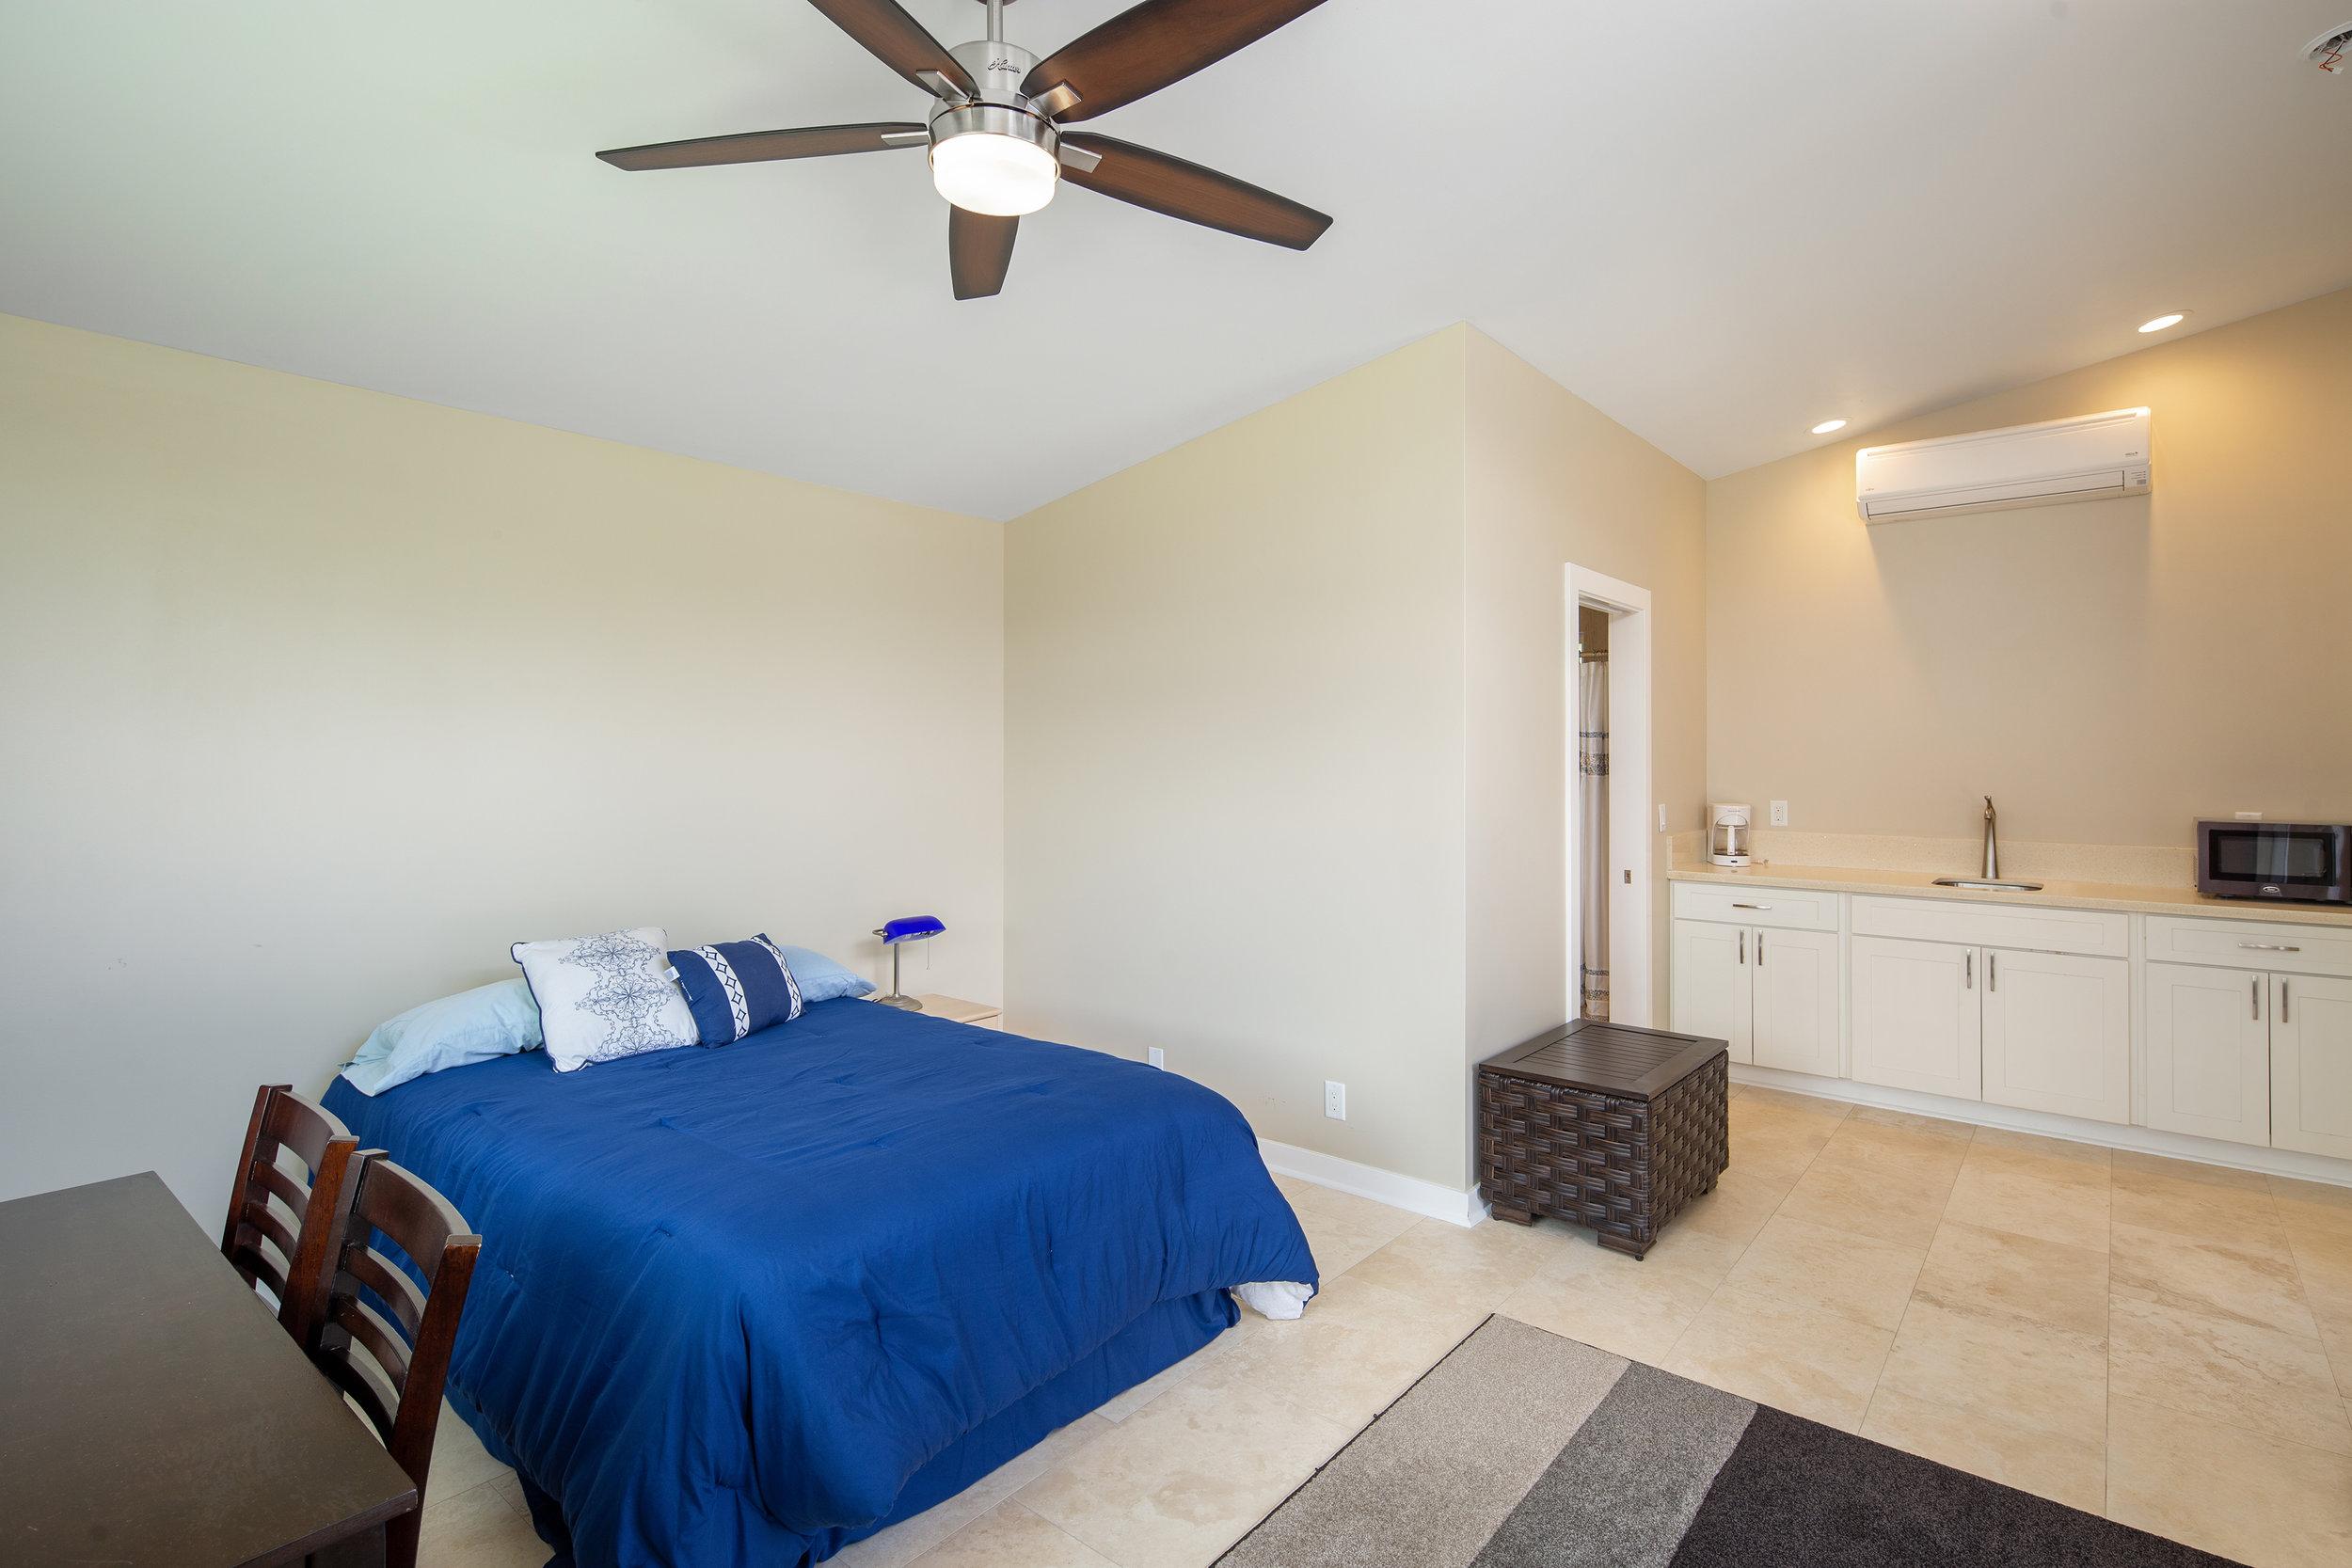 Guest house room 2.jpg